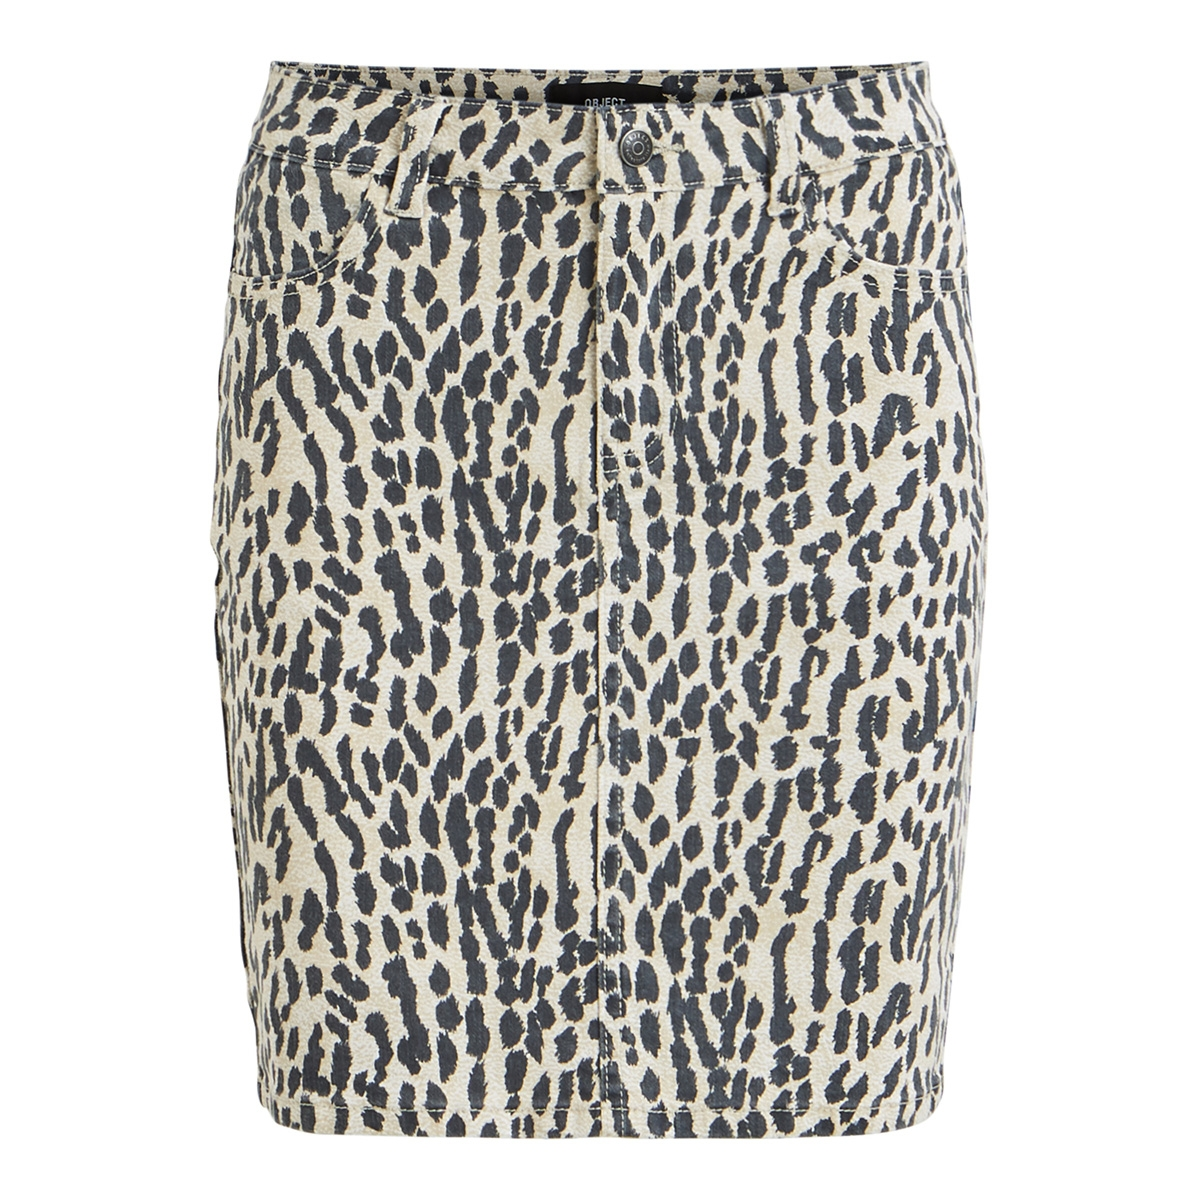 objwin new denim skirt aop seasonal 23030109 object rok humus